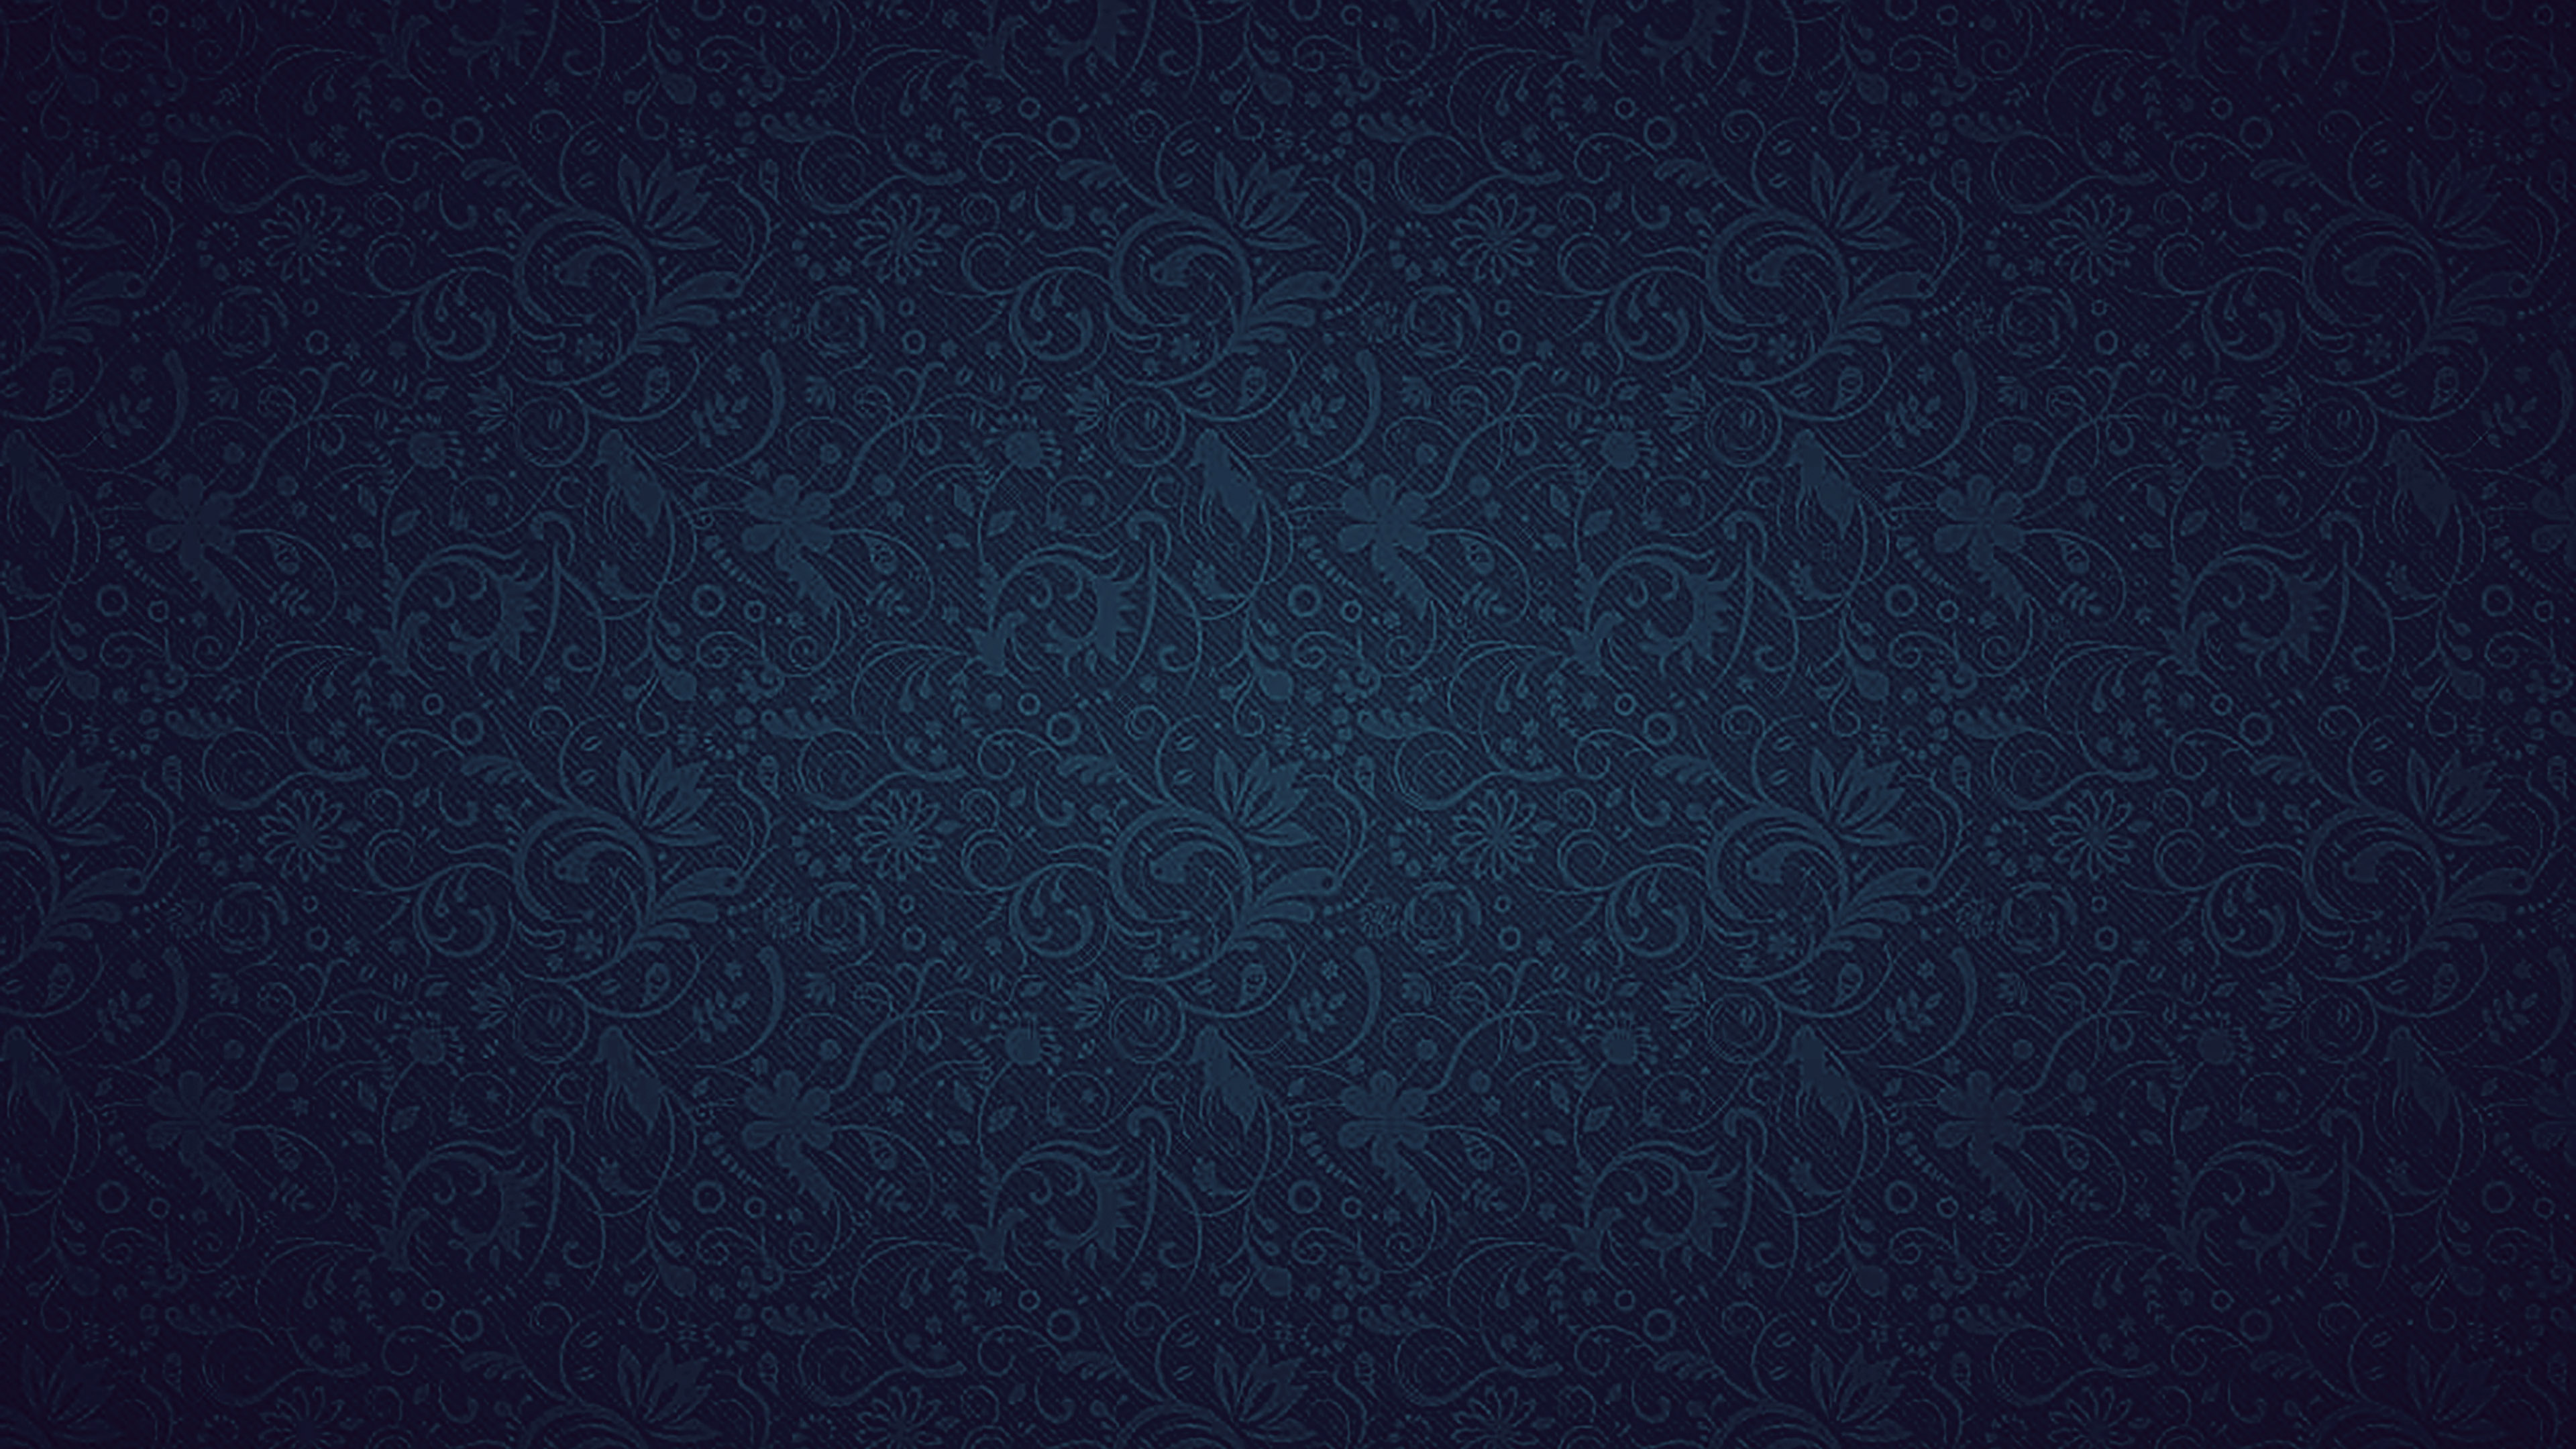 Vf81-dark-blue-ornament-texture-pattern